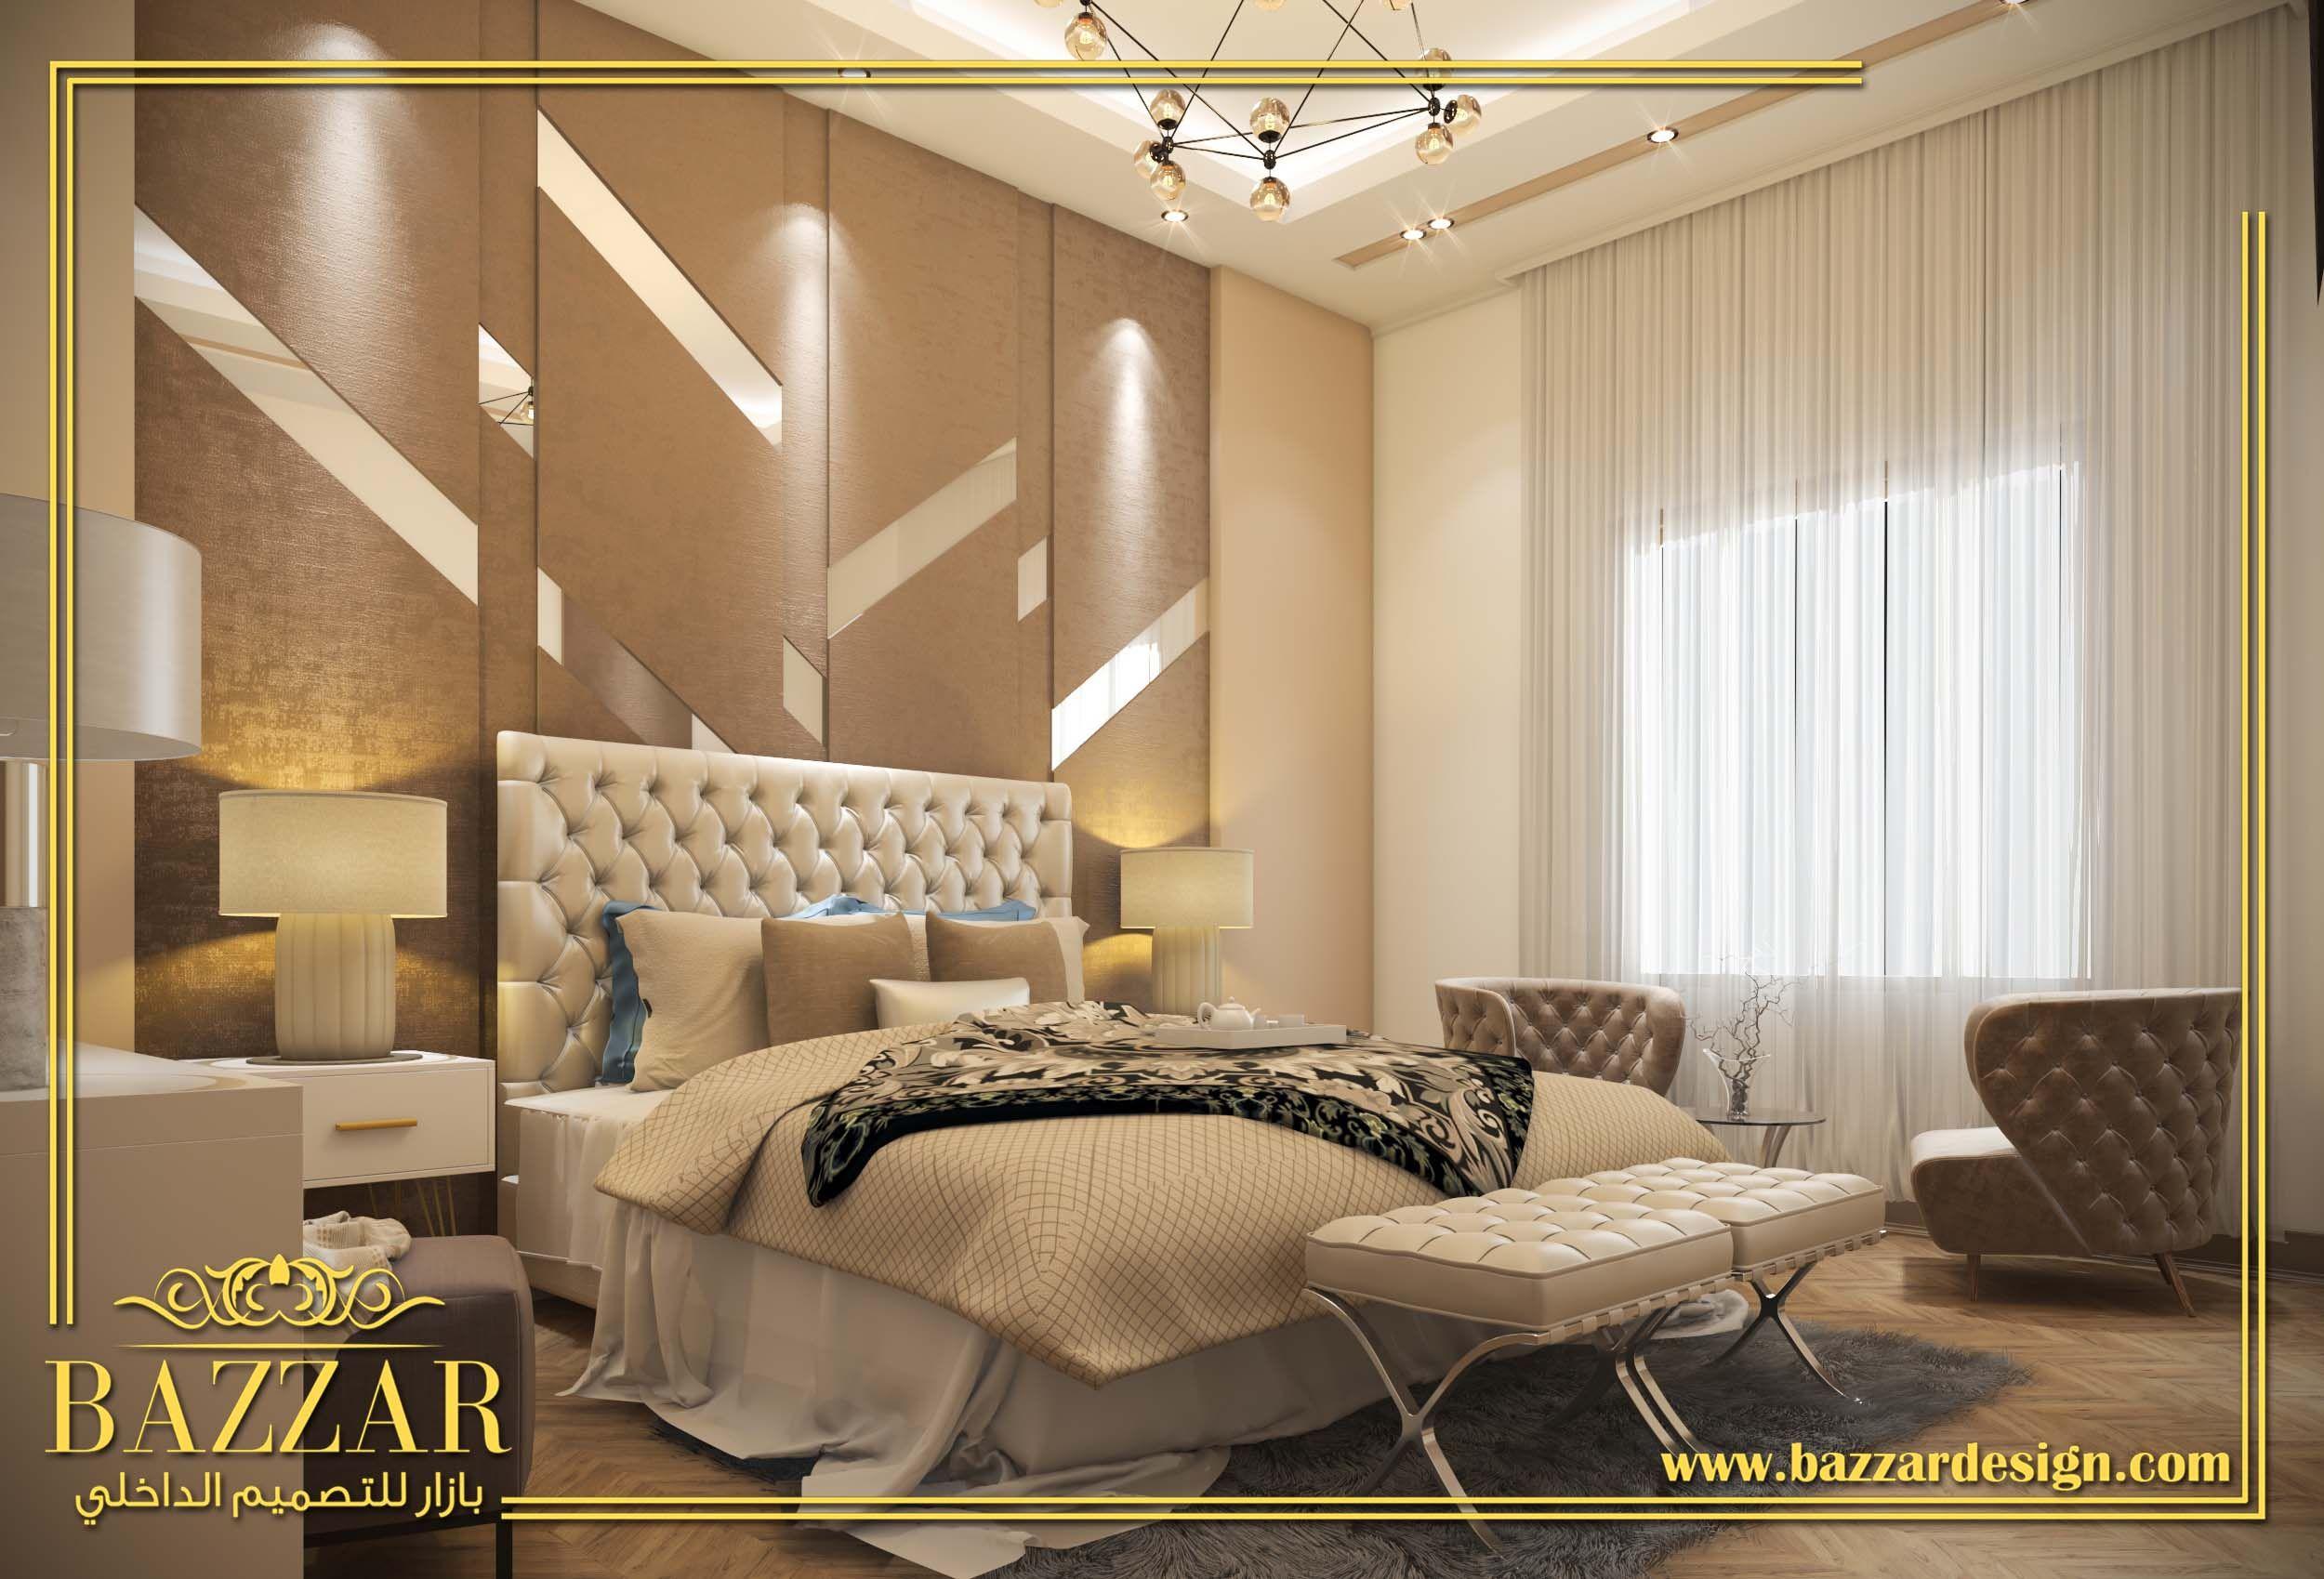 غرفة نوم ماستر نيوكلاسيك بيج وارضيات باركية Masterbedroom Neo Calasic With Barquit Flooring Bedroom Inspirations Home Decor Home